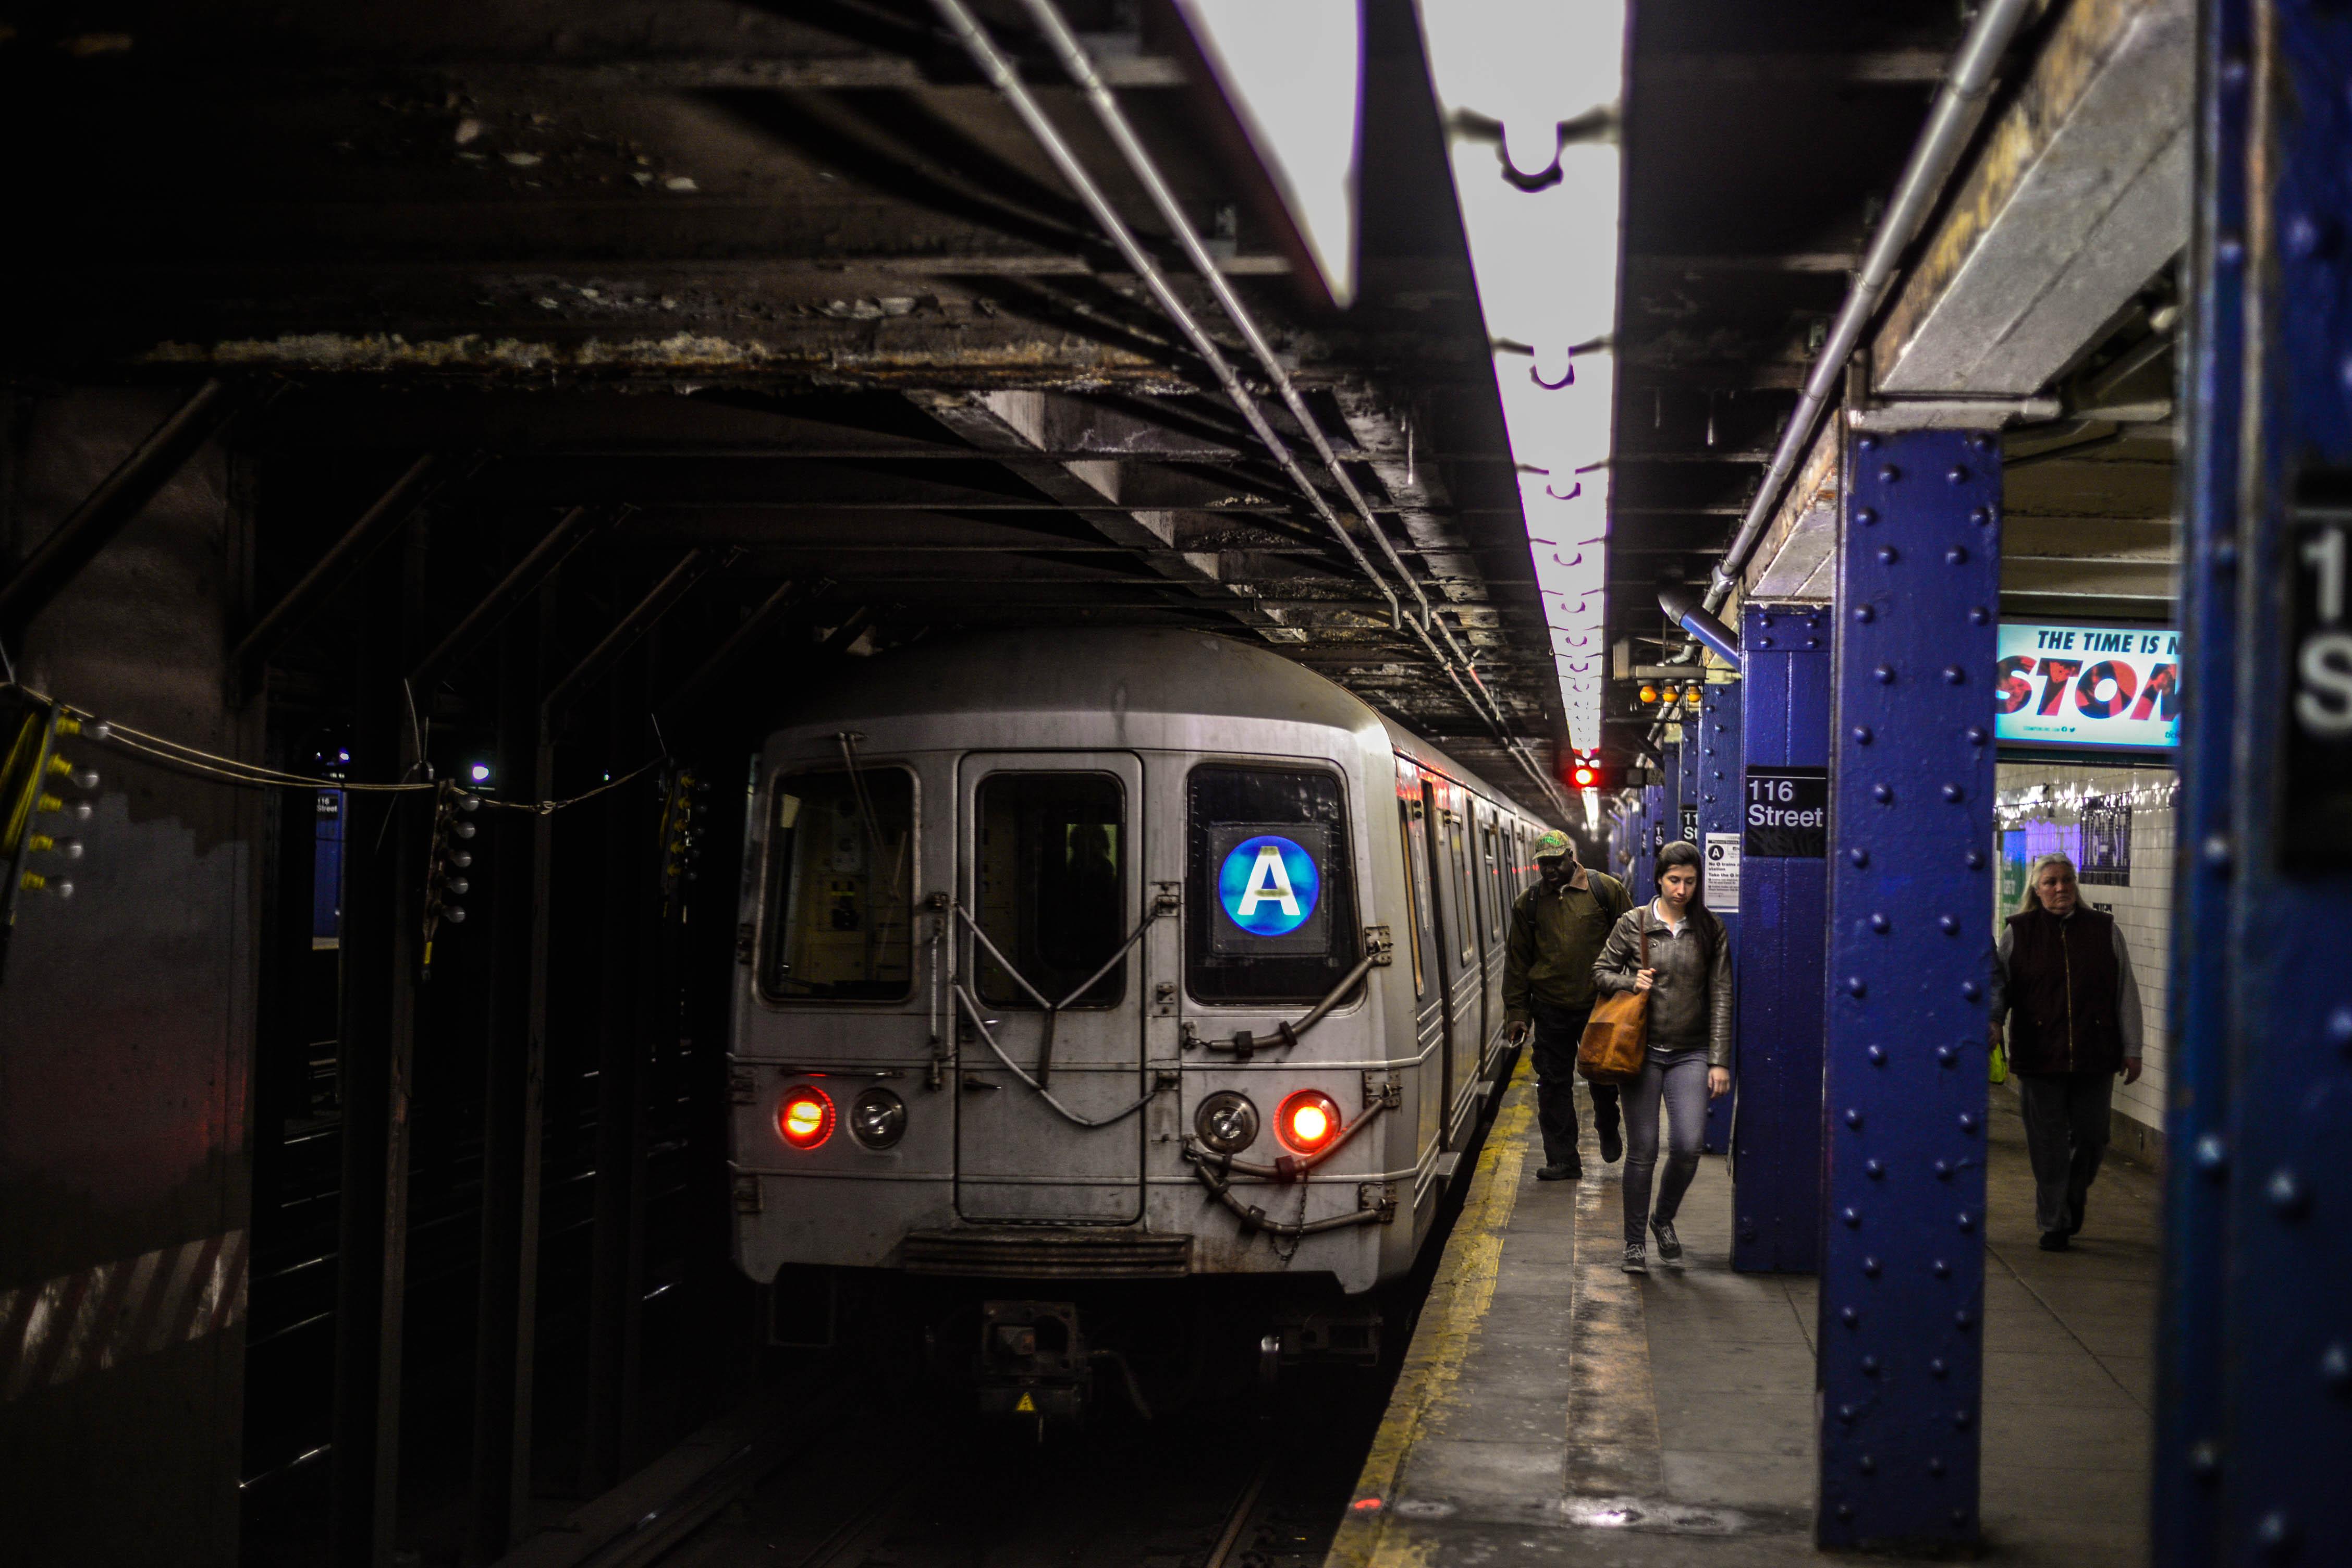 R46 A Train Leaves 116th Street Daniel The Cool Nyc Website